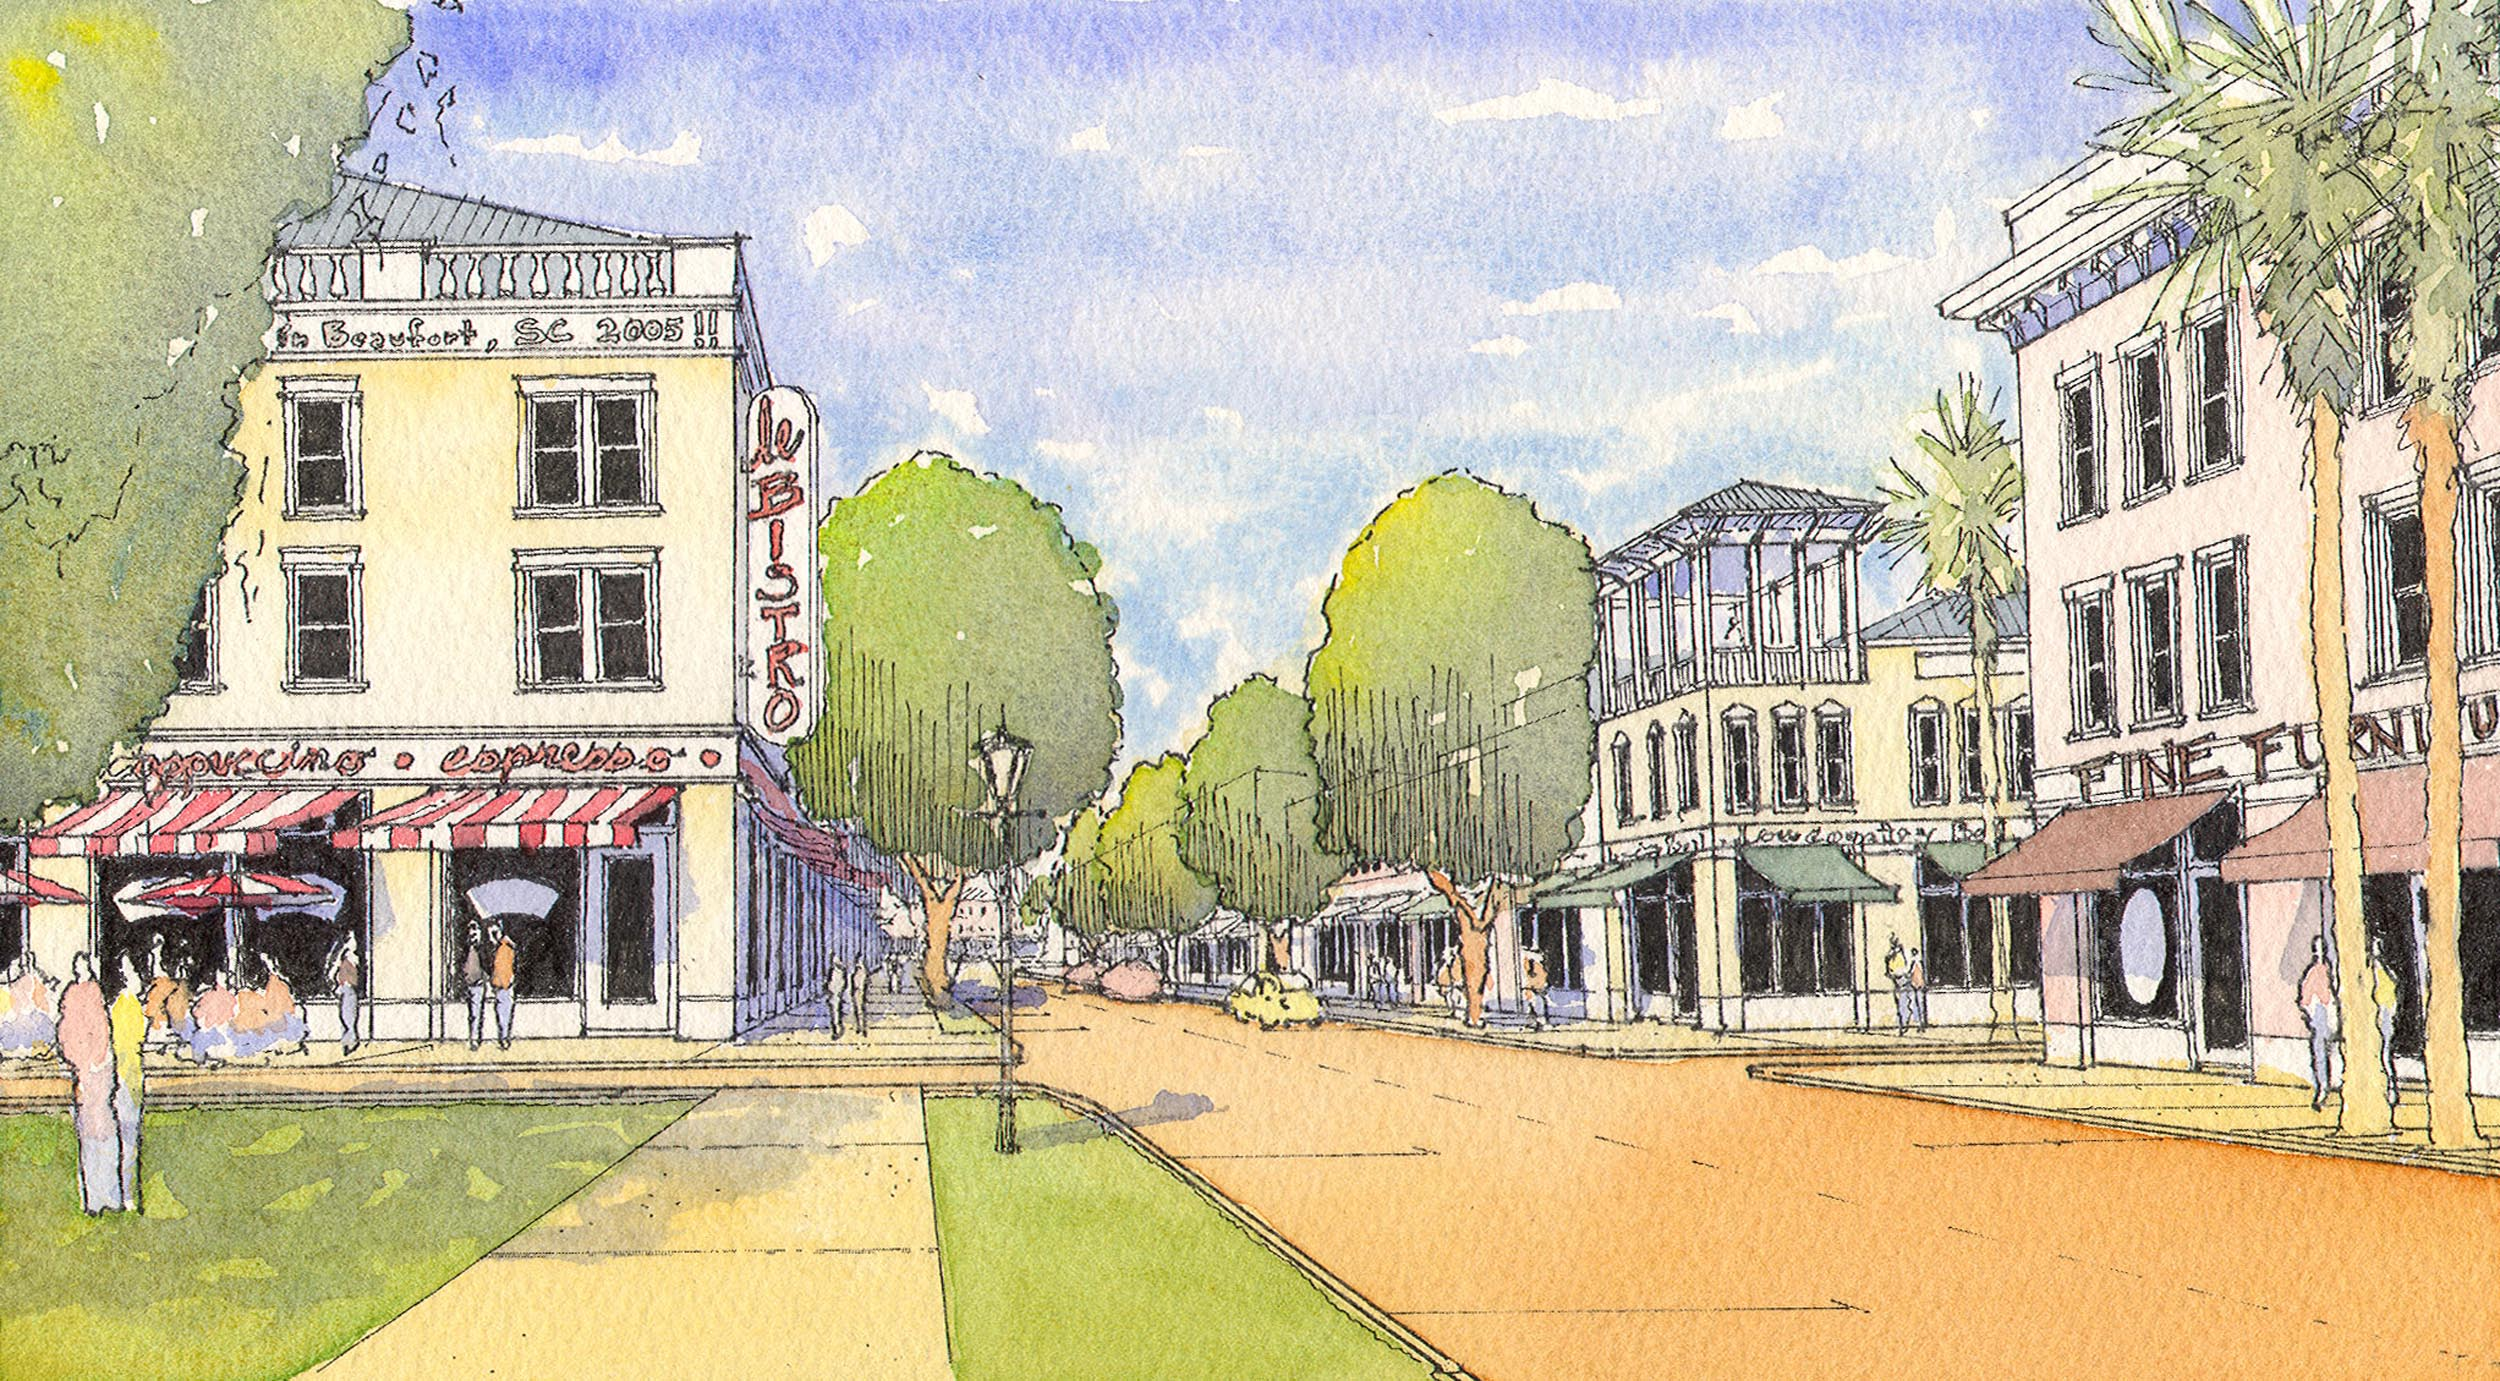 New development will be pedestrian-friendly